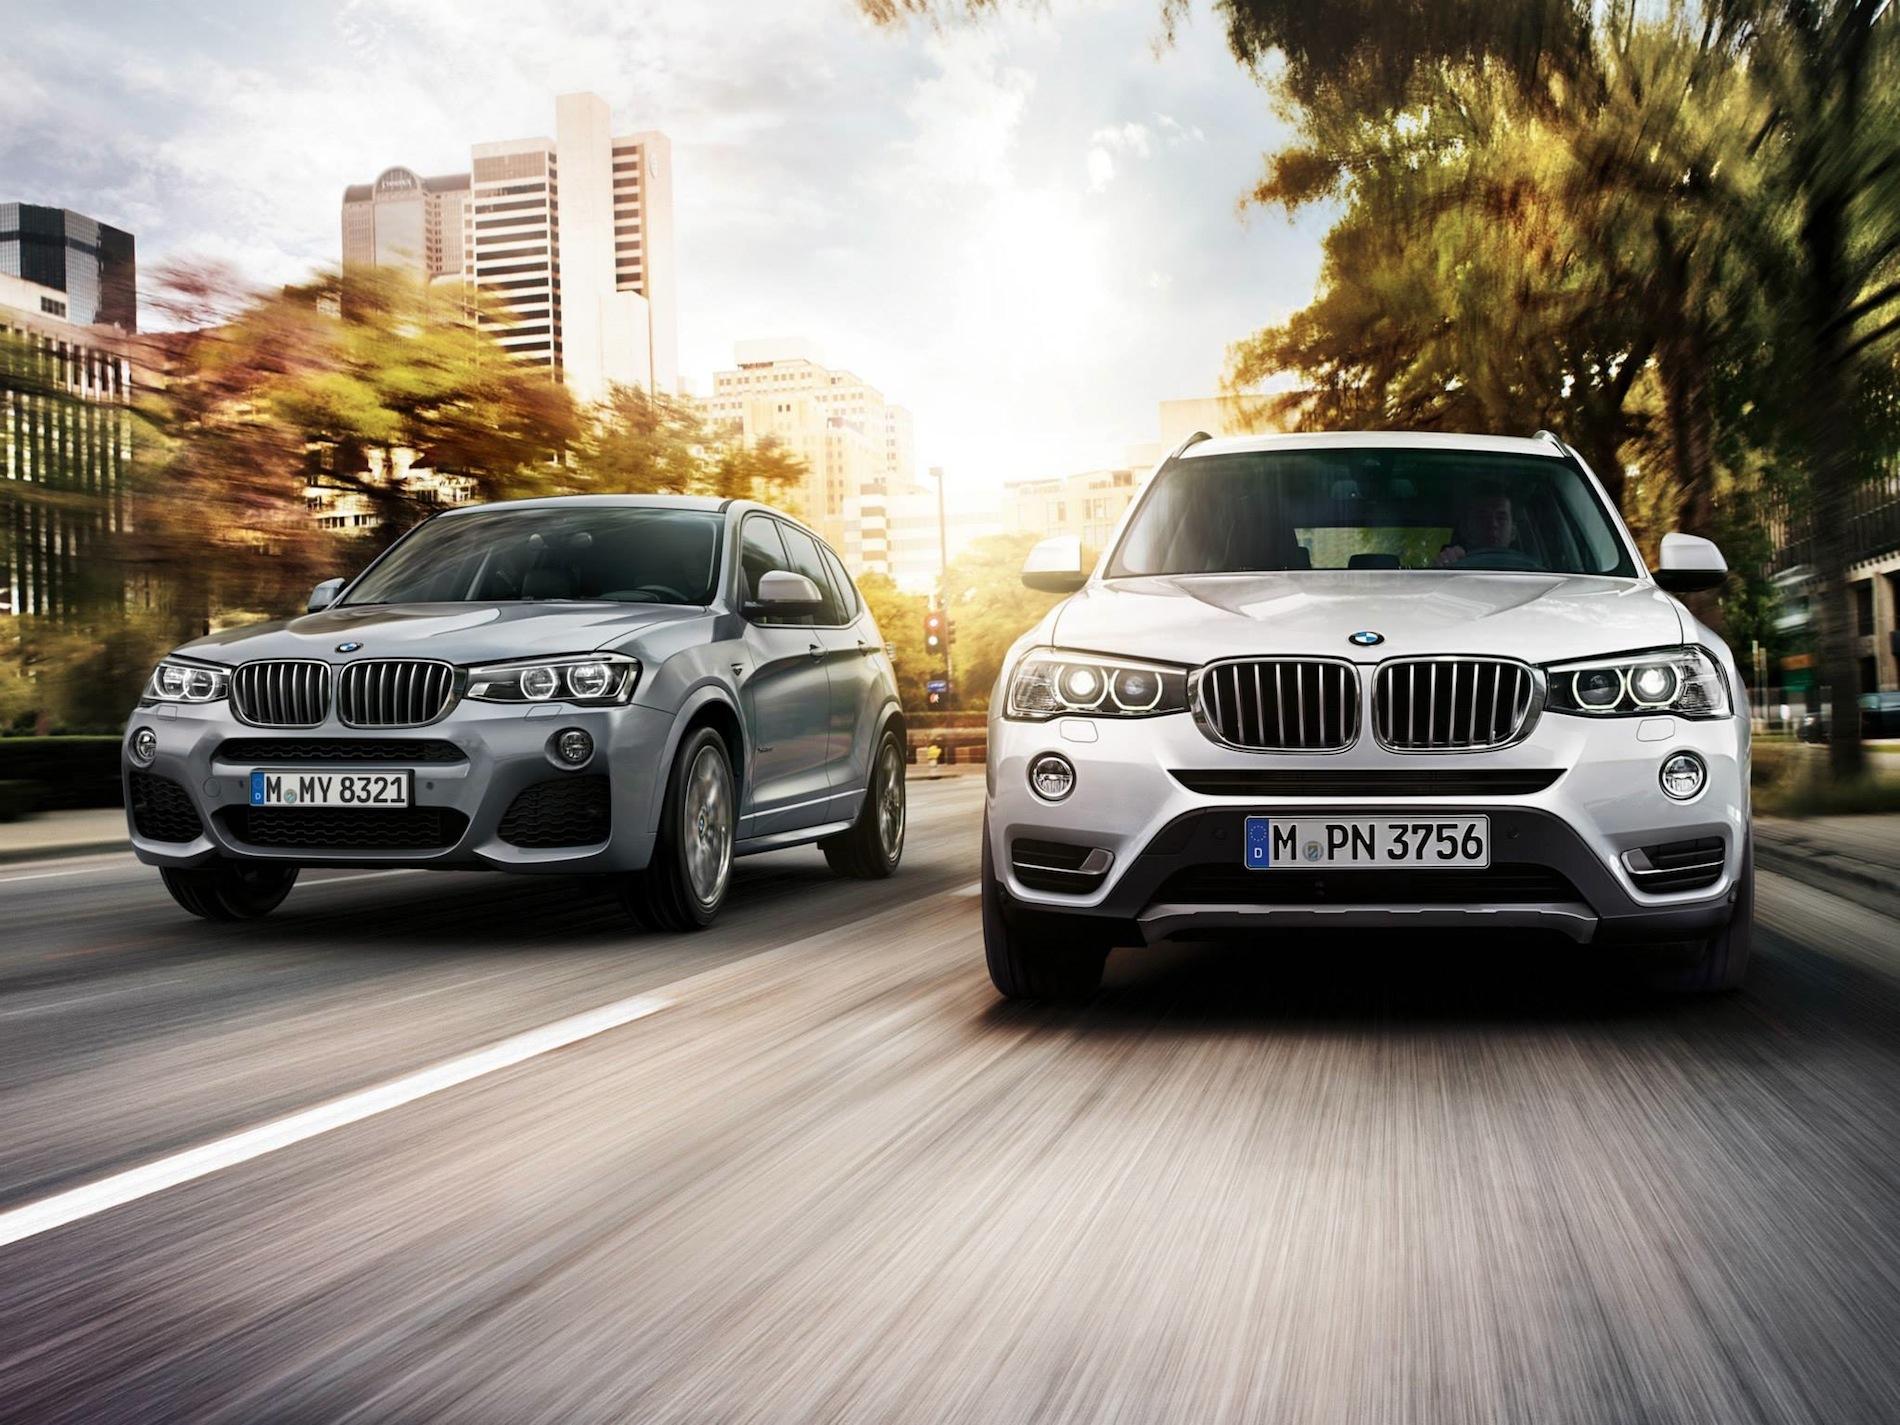 2015 BMW X3 LCI Facelift Refresh Page 15